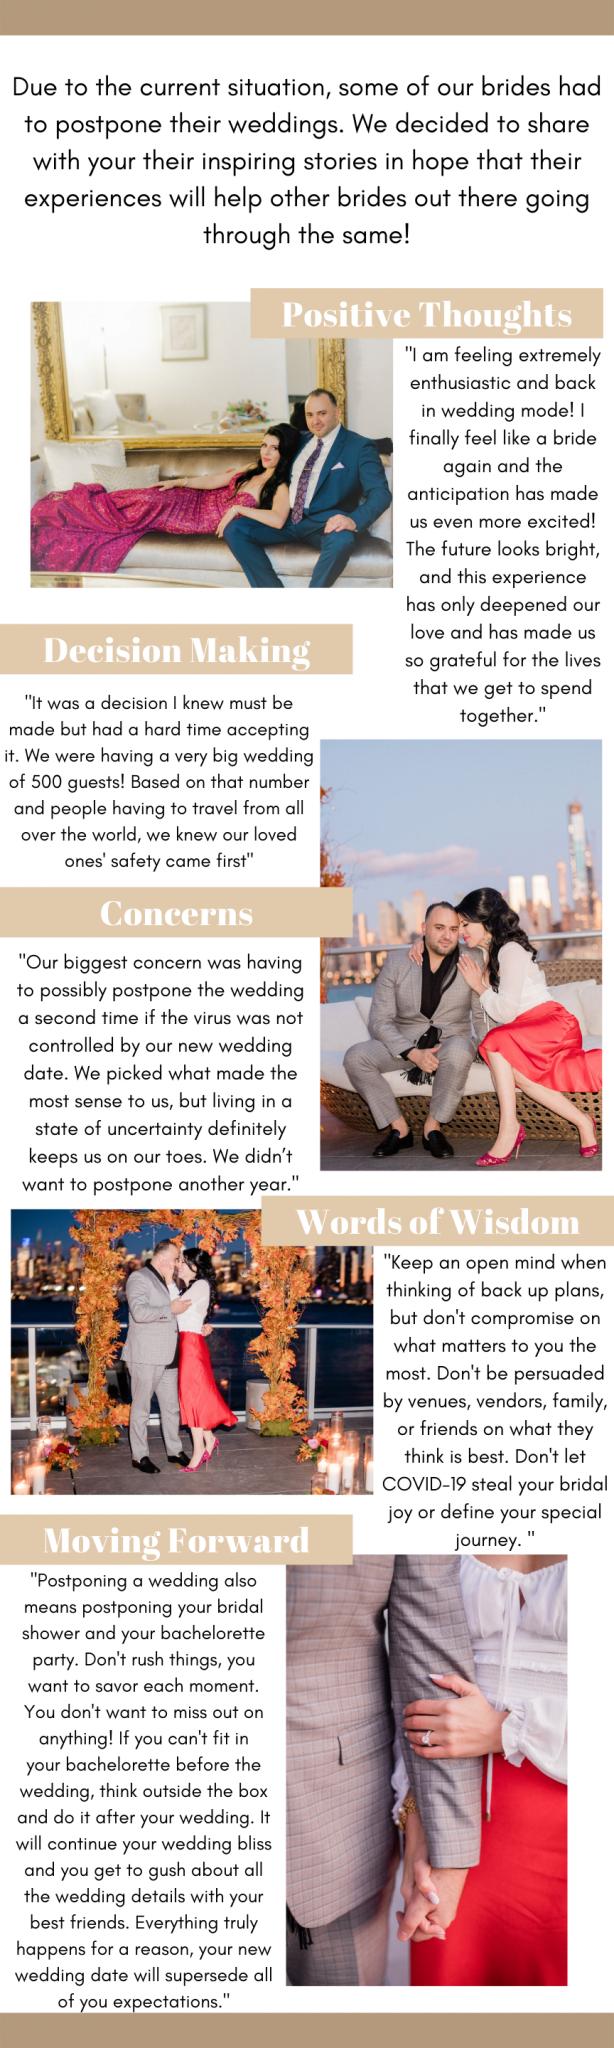 Corona bride blog post